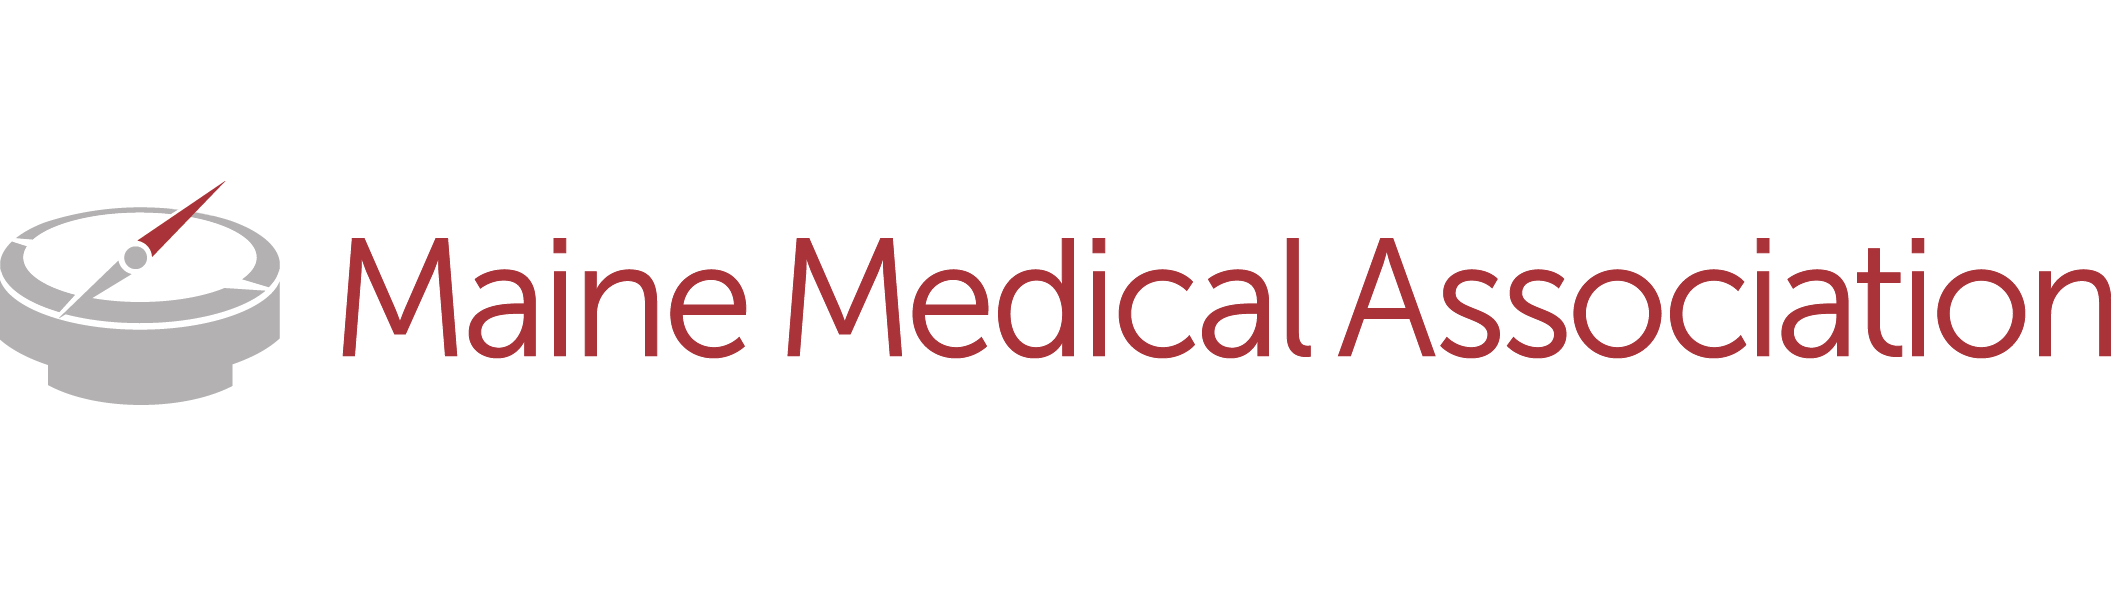 Maine Medical Association